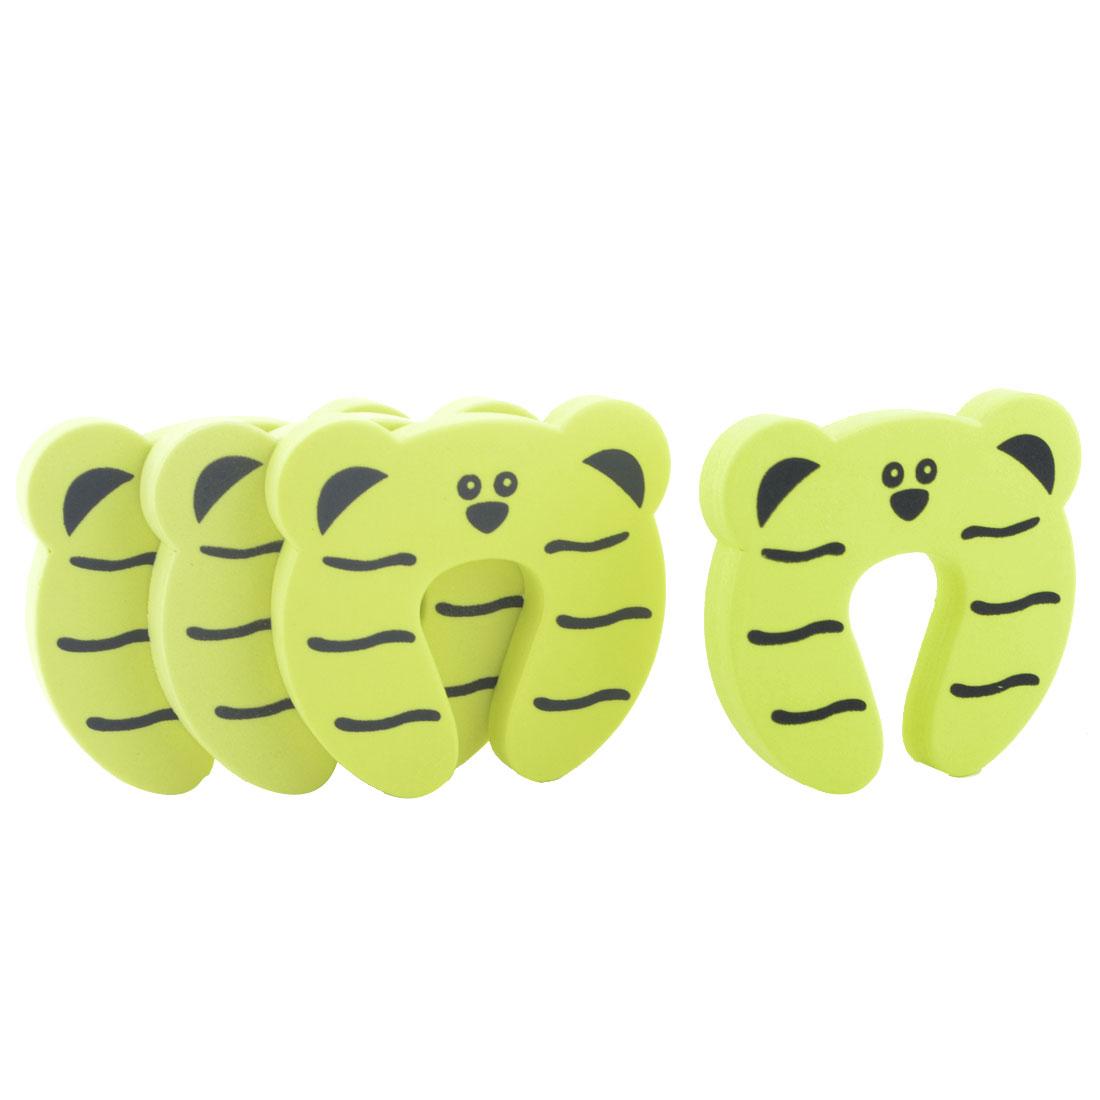 EVA Yellow Tiger Shape Finger Protector Safety Guard Doorstop Door Stopper Lock 4pcs